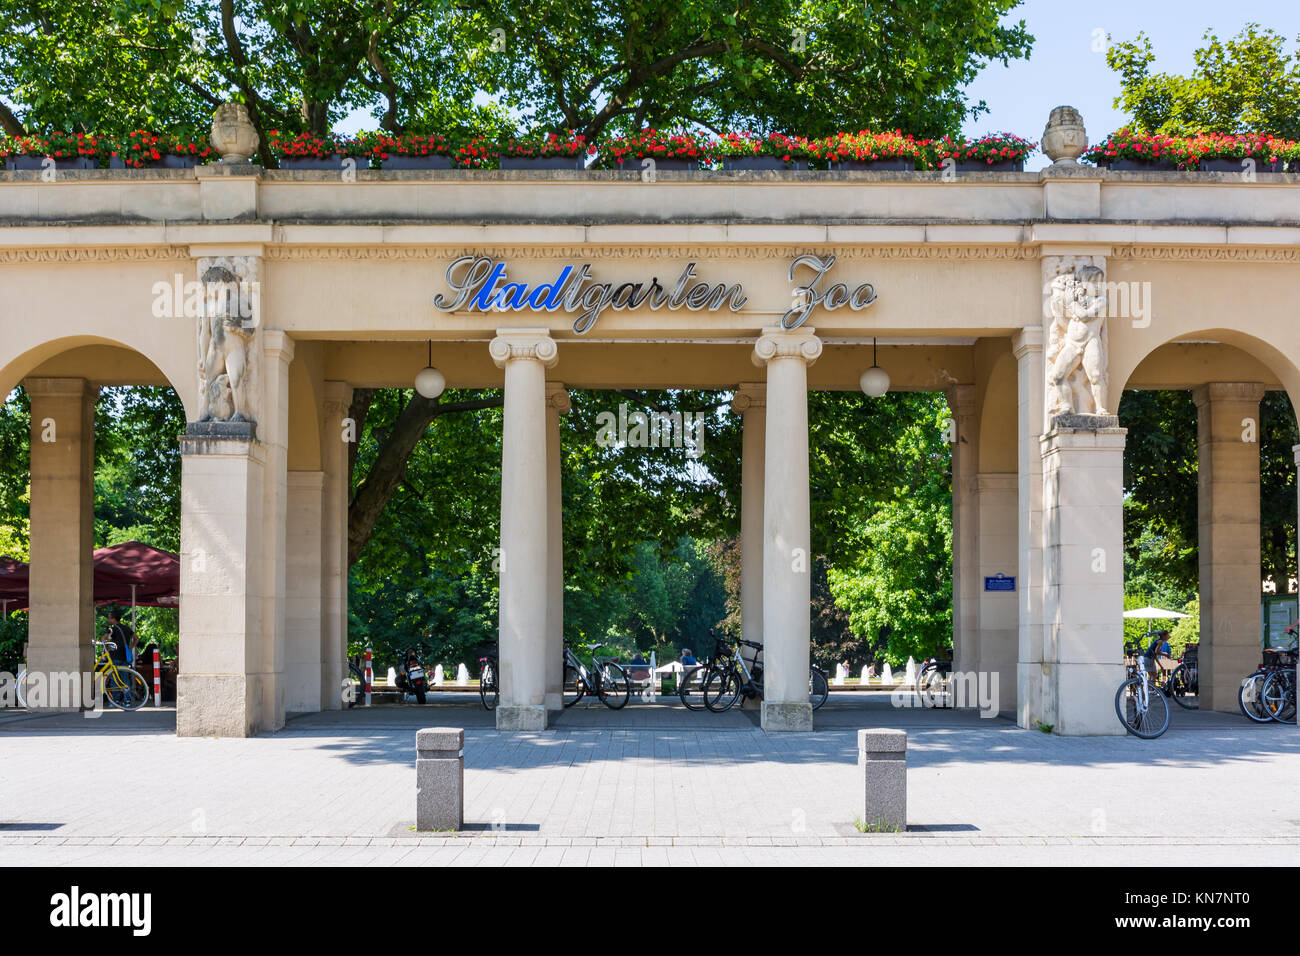 Foyer Luxury Zoo : Karlsruhe zoo stock photos images